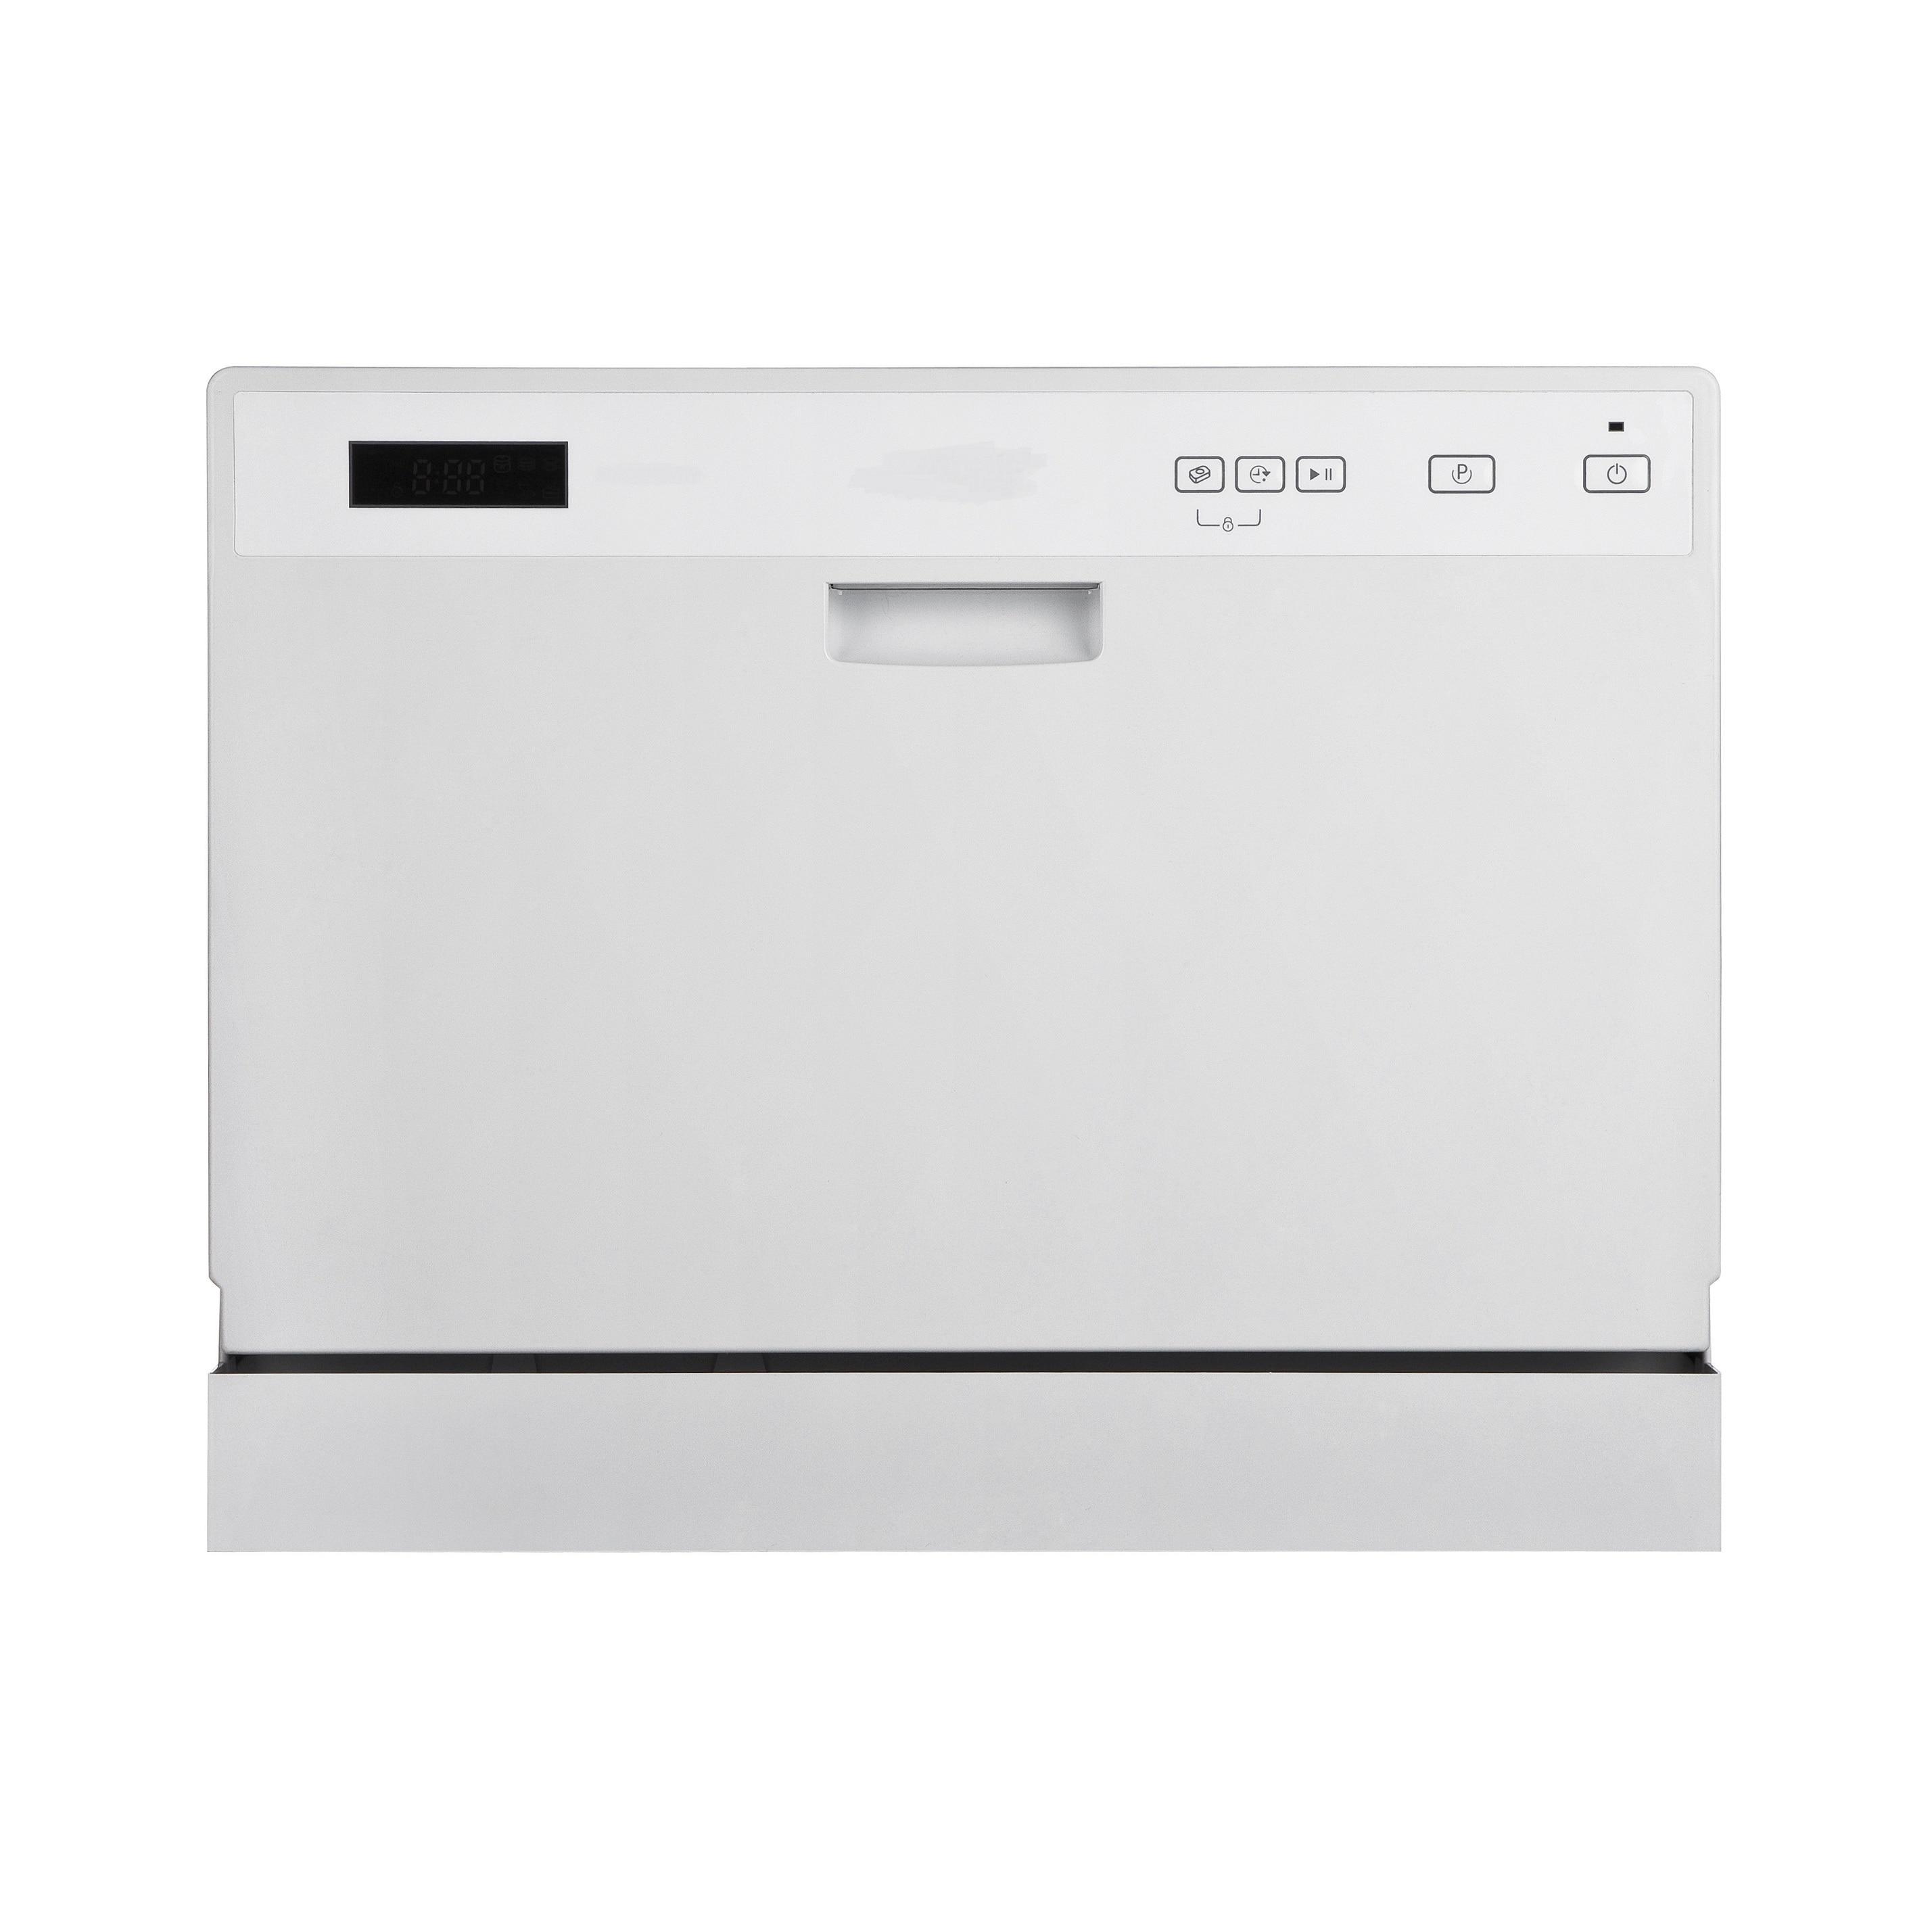 Domestic Equator-Midea Countertop Dishwasher (Countertop ...